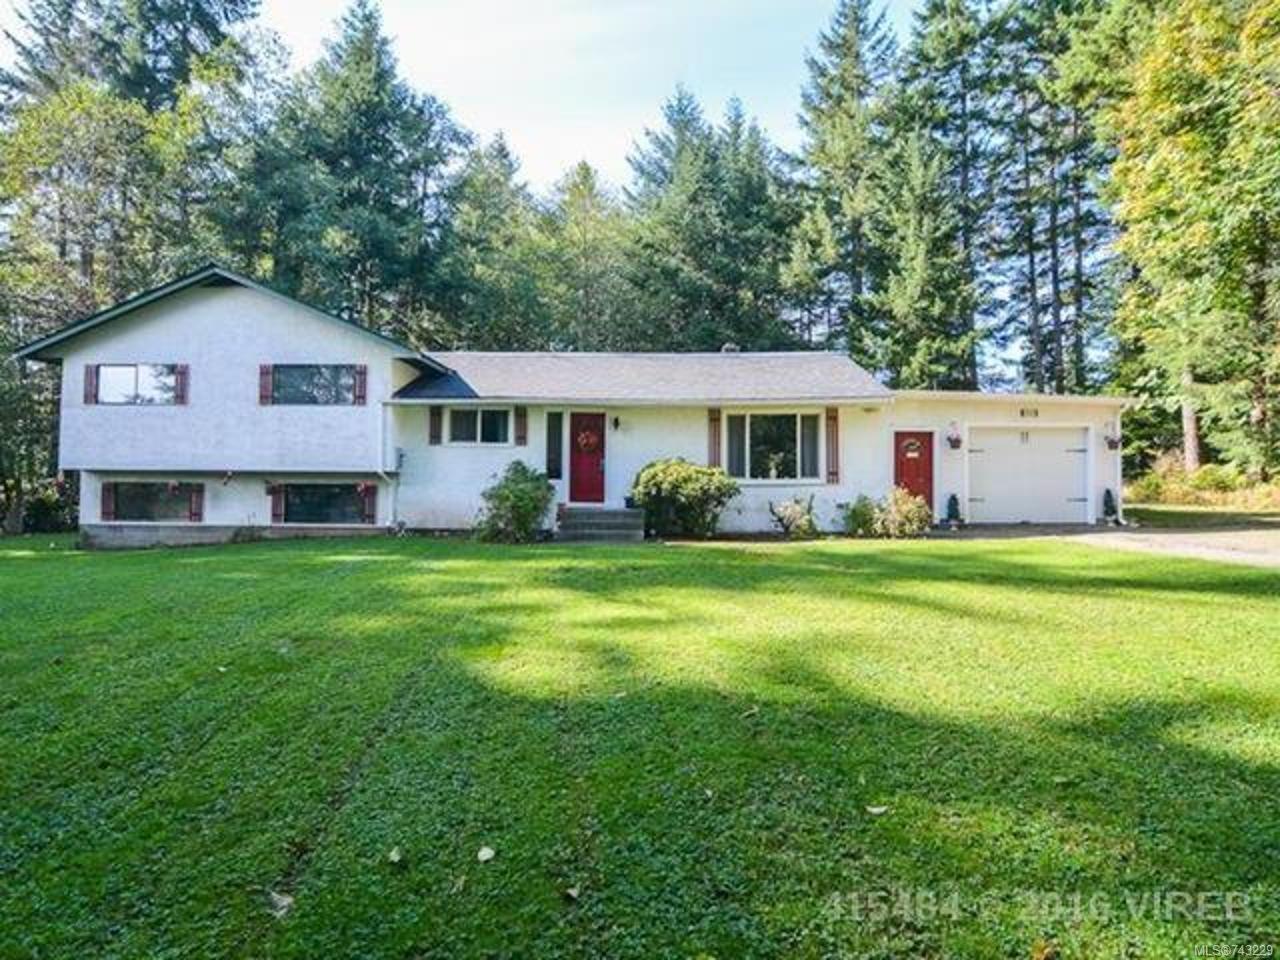 Main Photo: 7353 N Island Hwy in MERVILLE: CV Merville Black Creek House for sale (Comox Valley)  : MLS®# 743229